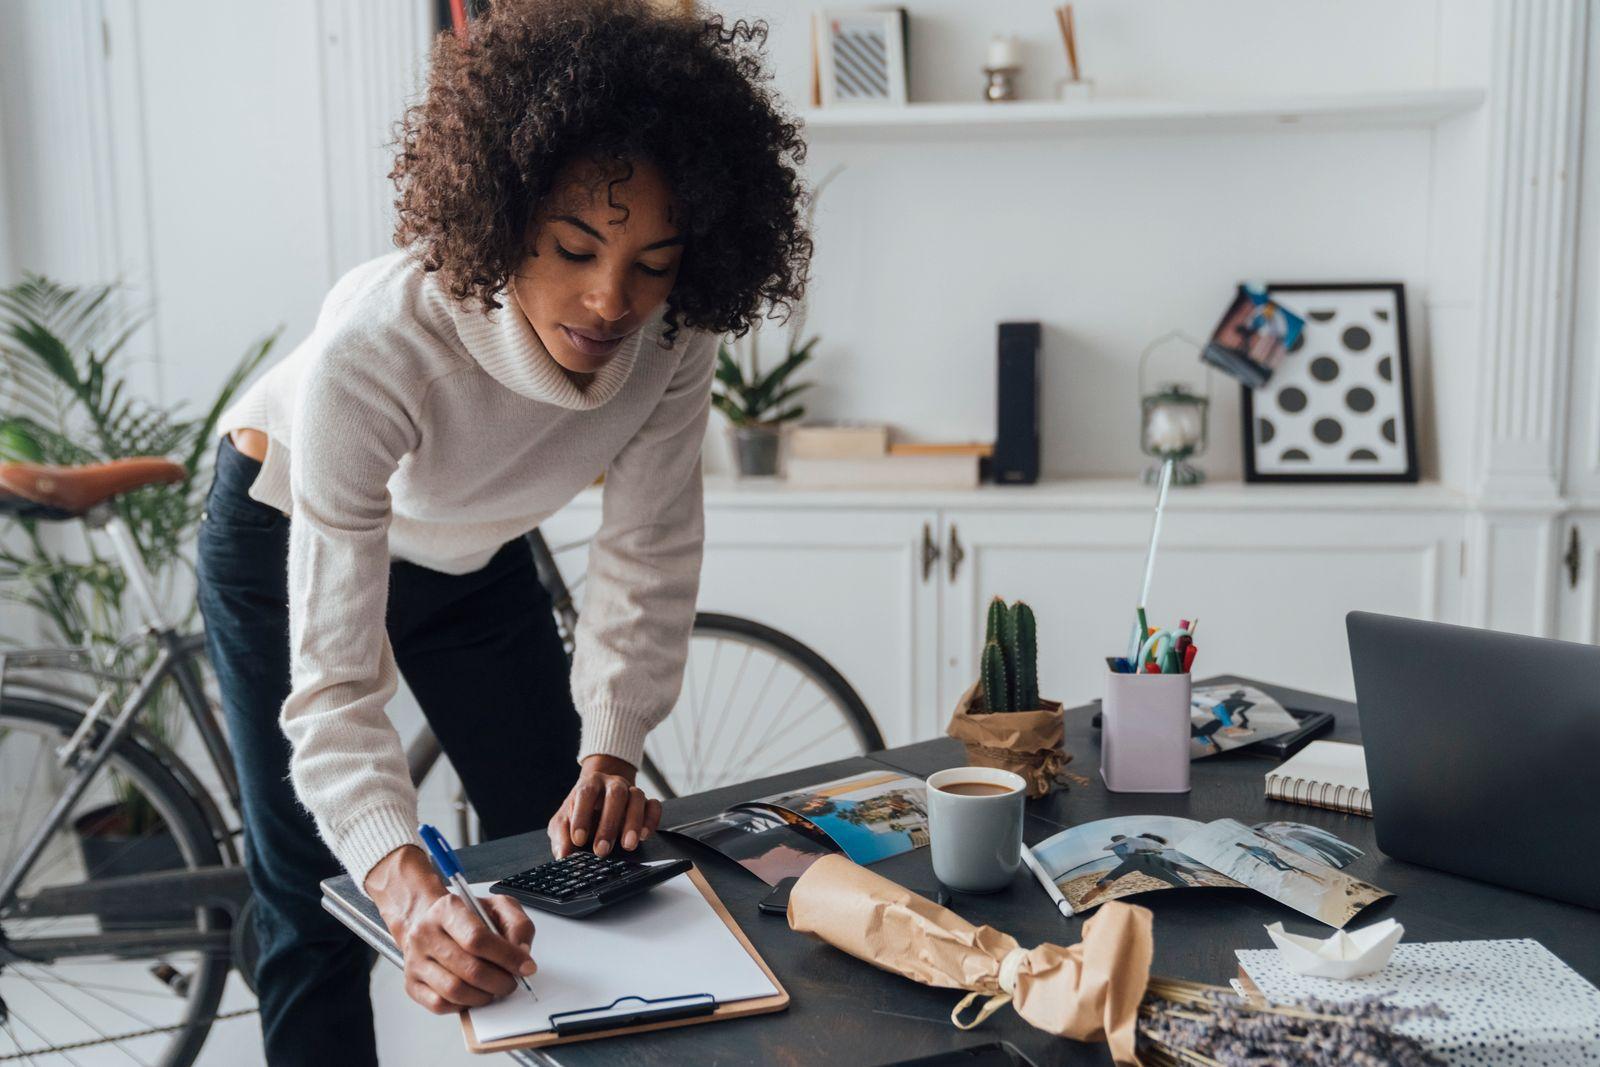 Freelancer standing at hert desk, using calculater, taking notes